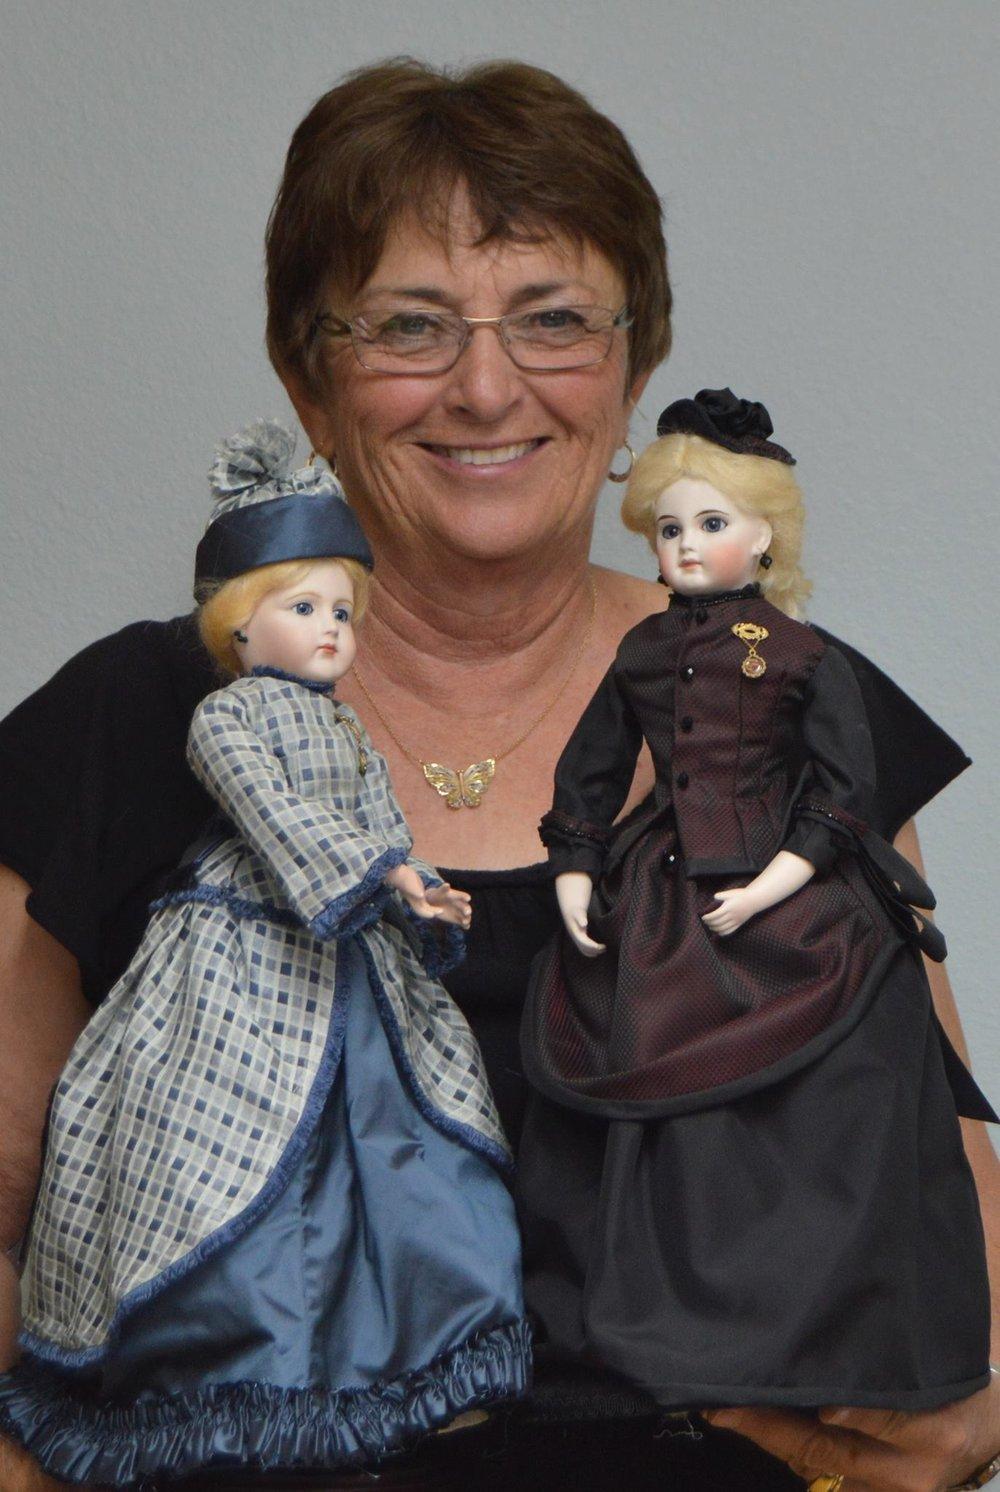 Linda+Wall+Doll+Artist+Virtual+Doll+Convention.jpg